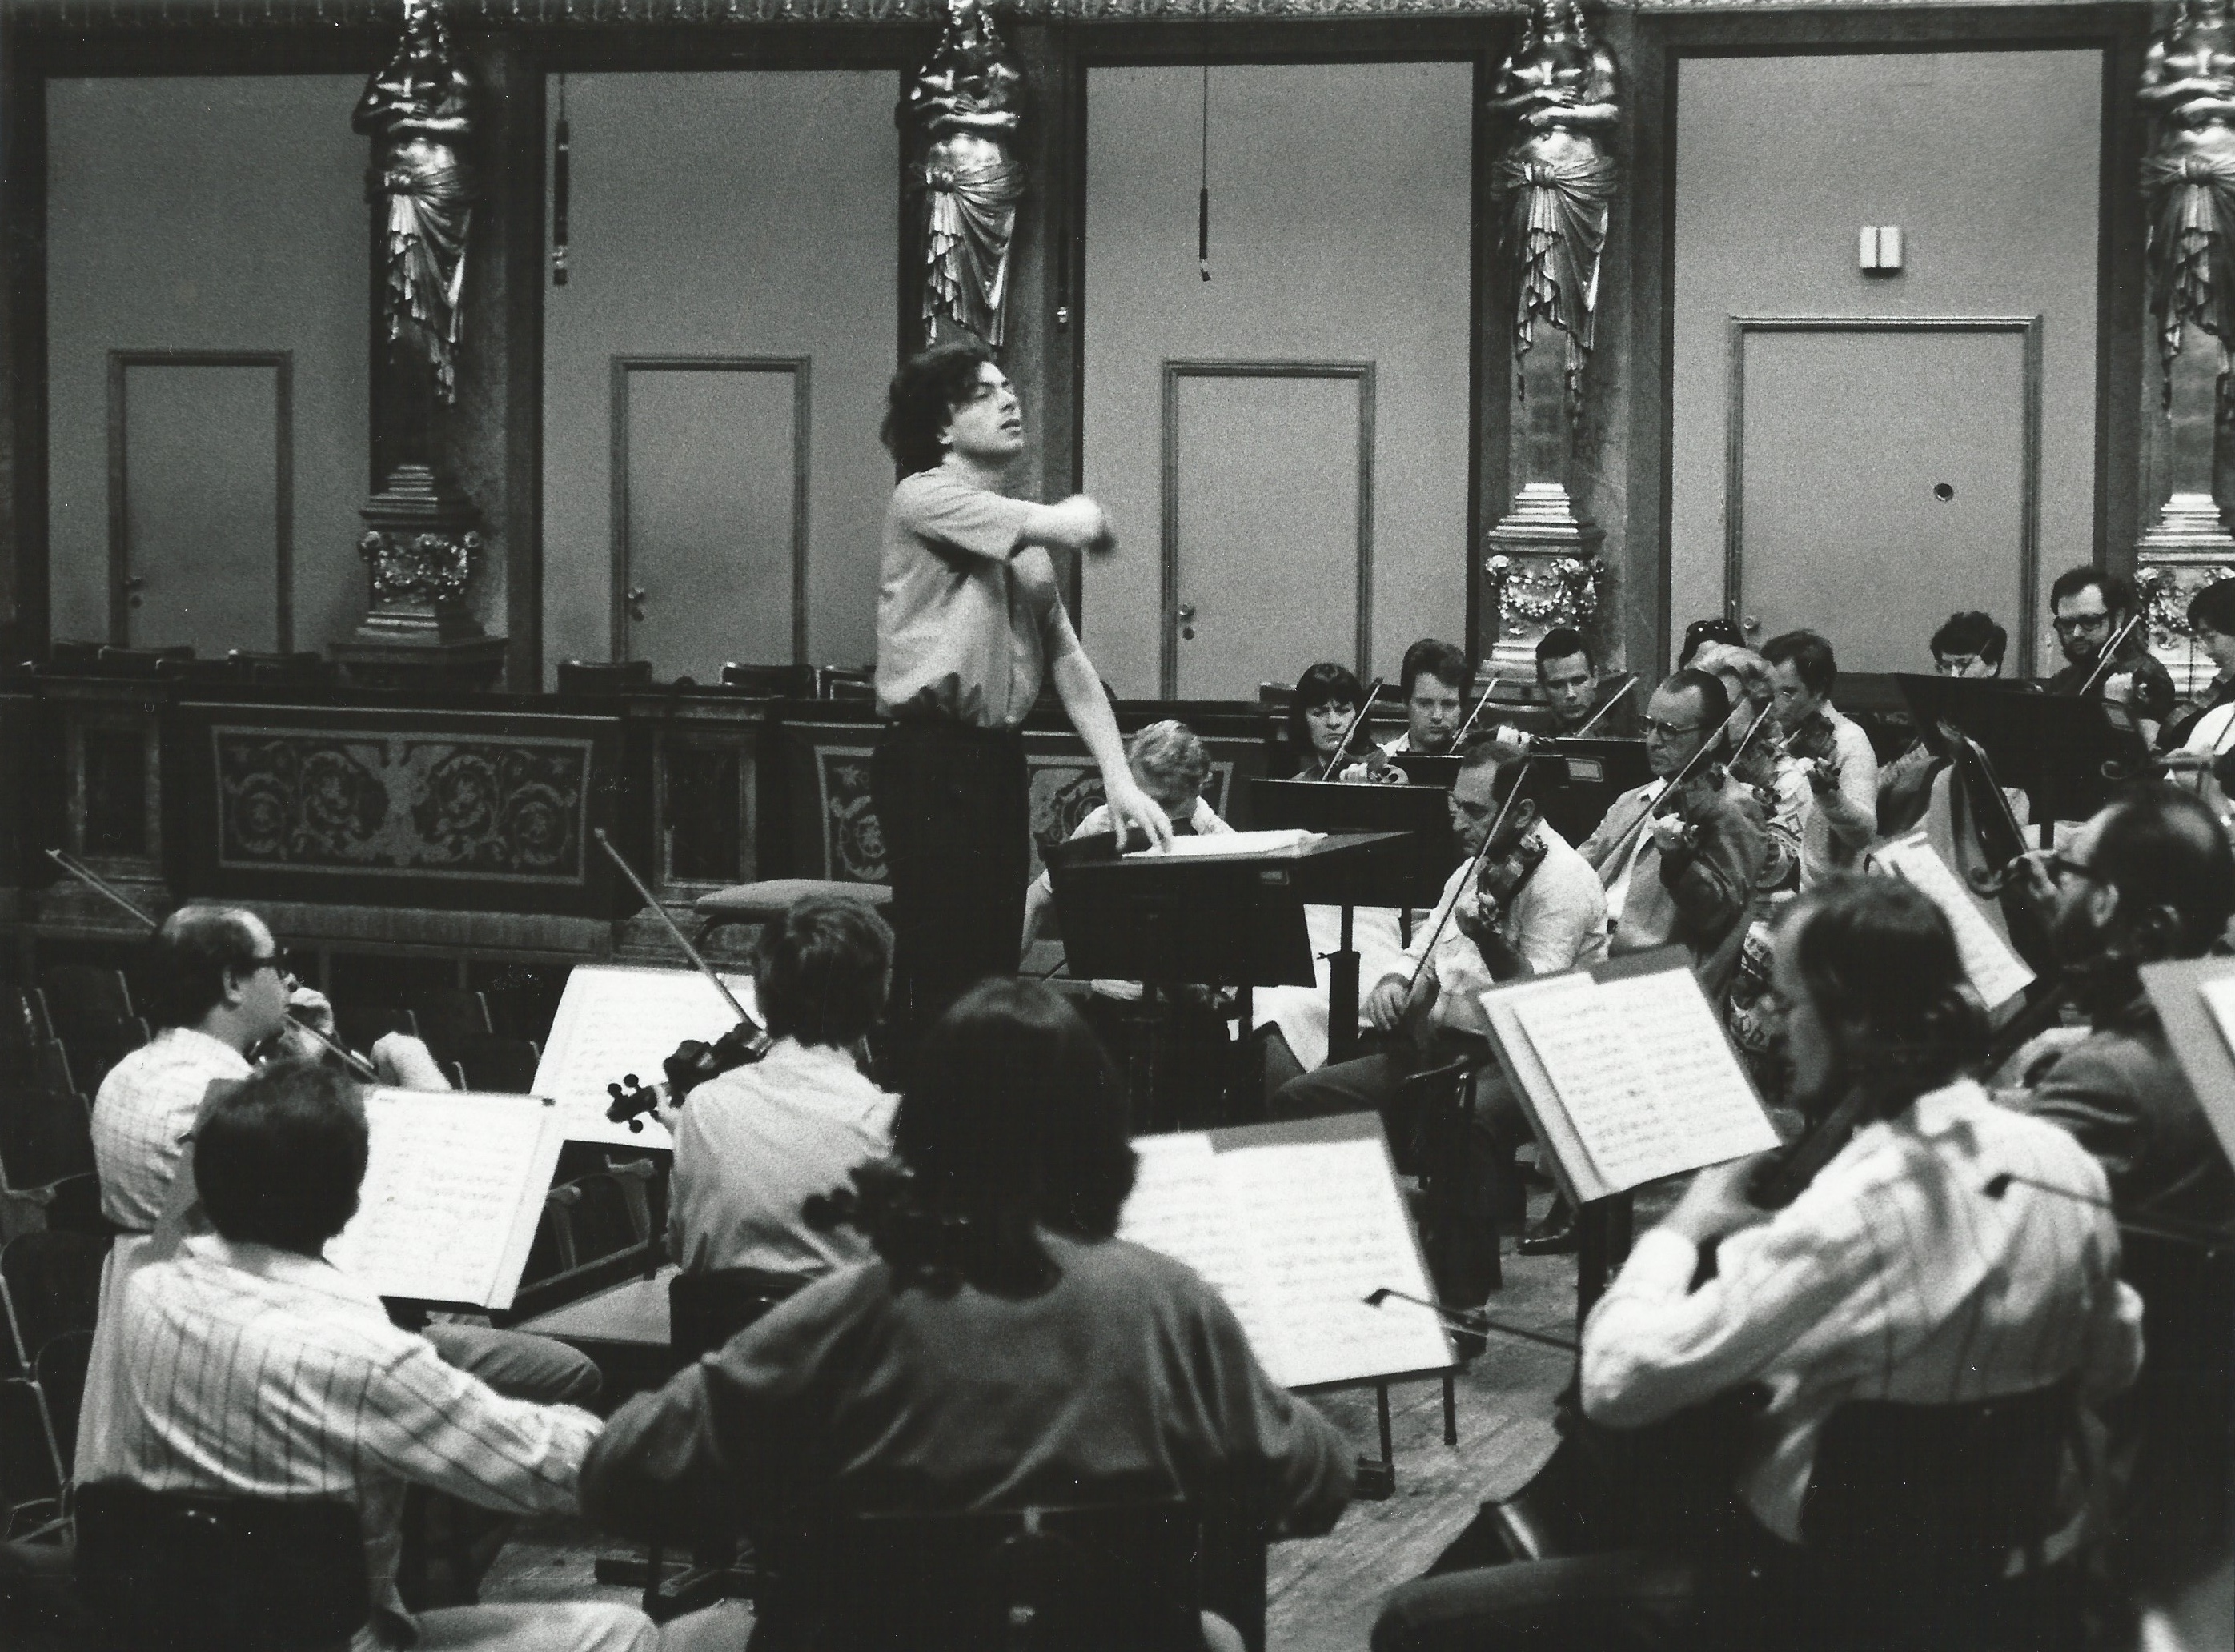 ALBERTO CAPRIOLI REHEARSING GUSTAV MAHLER, ADAGIO FROM THE 10. SYMPHONYWITH THE NÖ-TONKÜNSTLER-ORCHESTER. VIENNA, MUSIKVEREIN, GROßER SAAL, JUNE 1983, PHOTO ZIMMERMANN